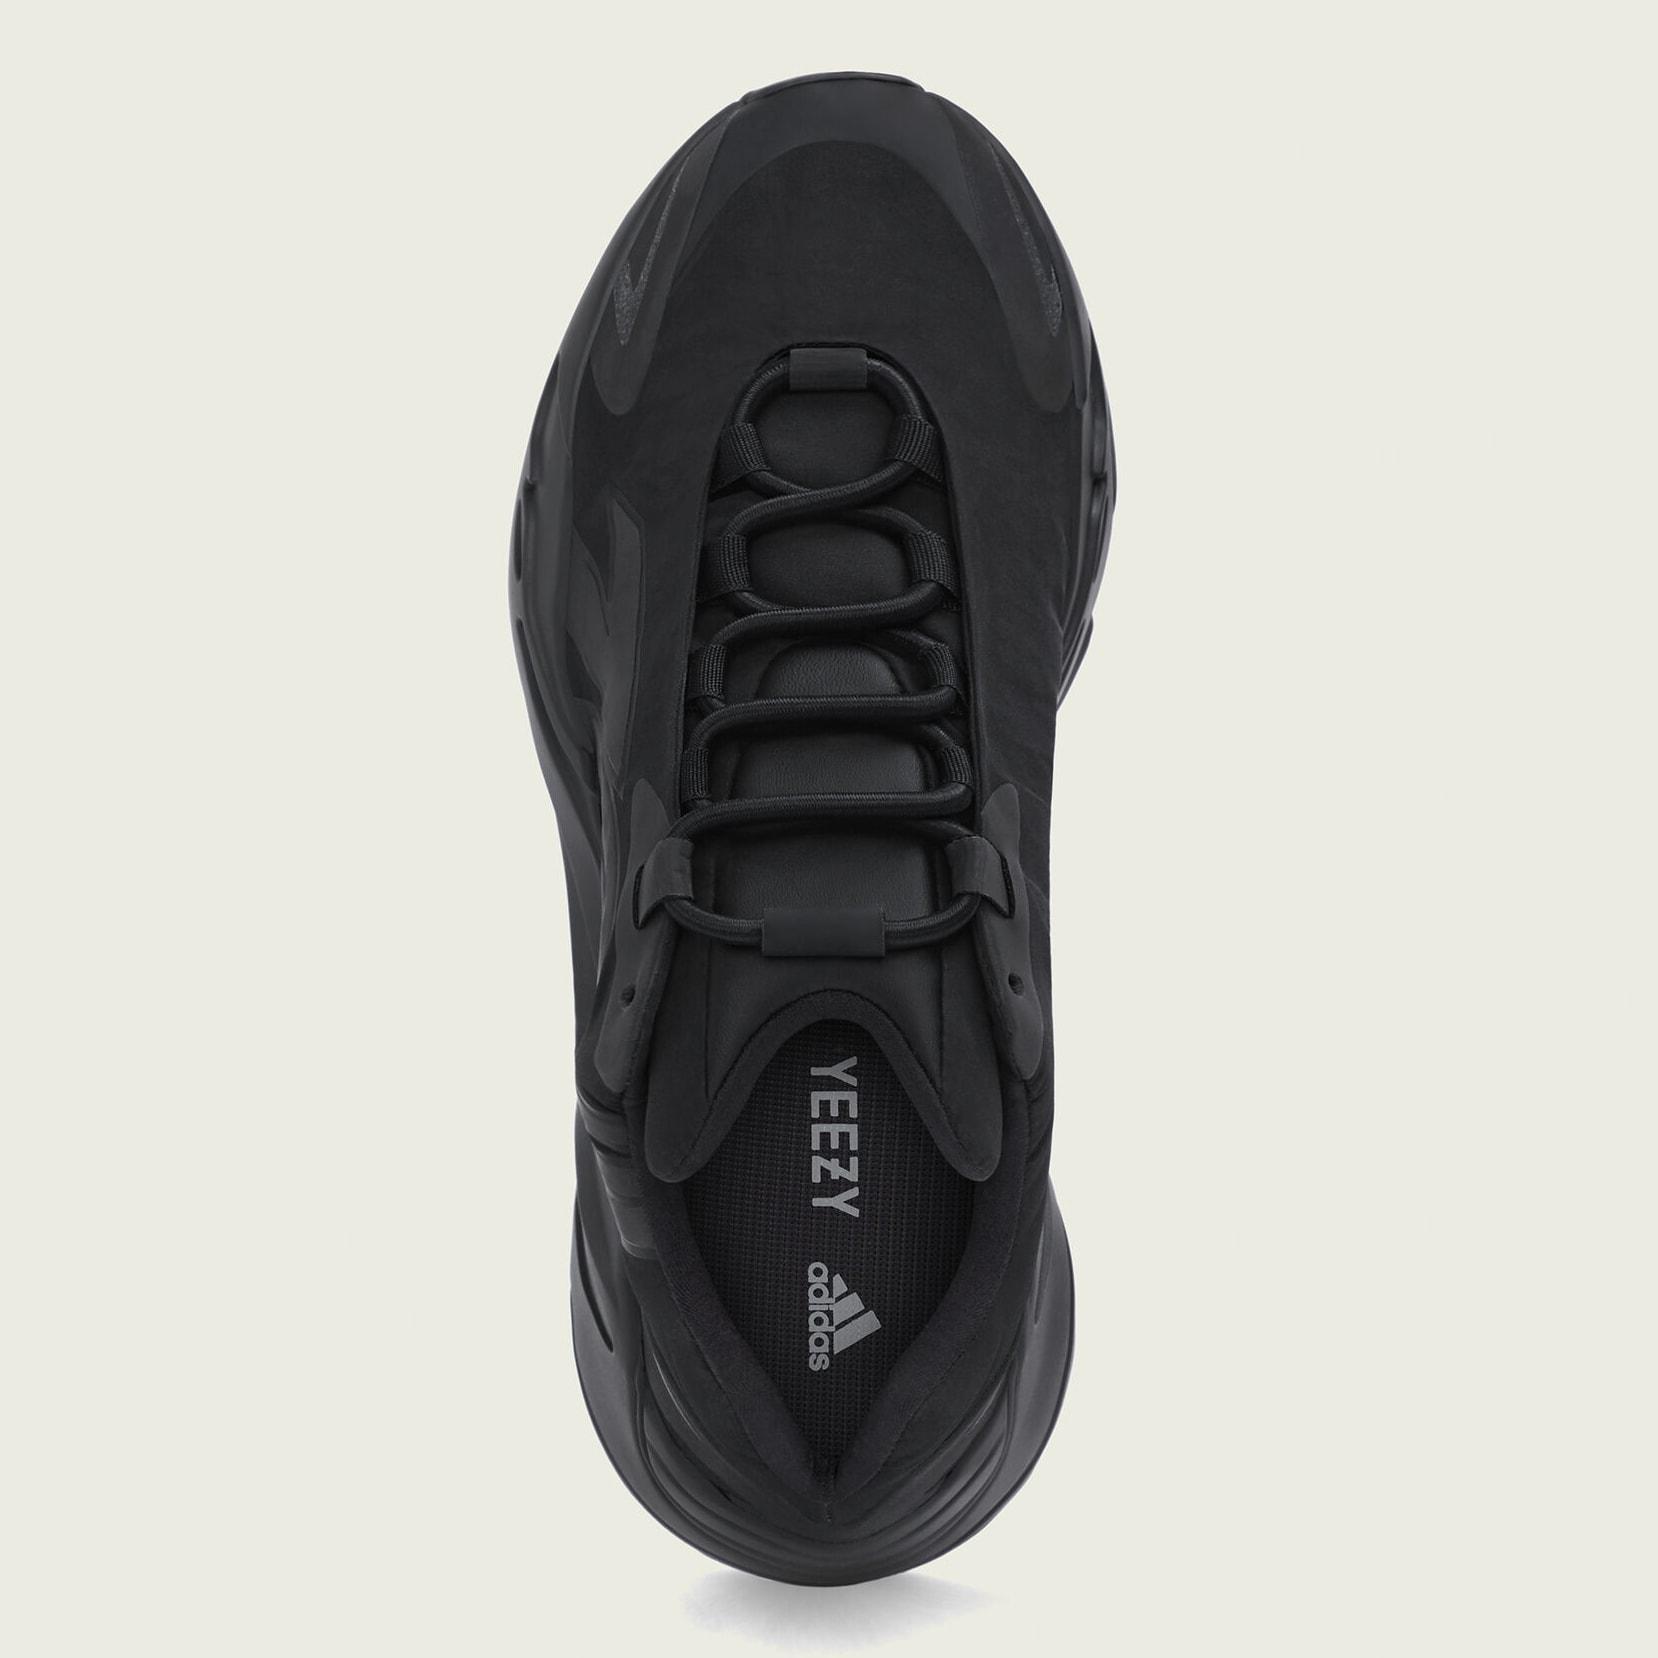 adidas-700-mnvn-triple-black-fv4440-top